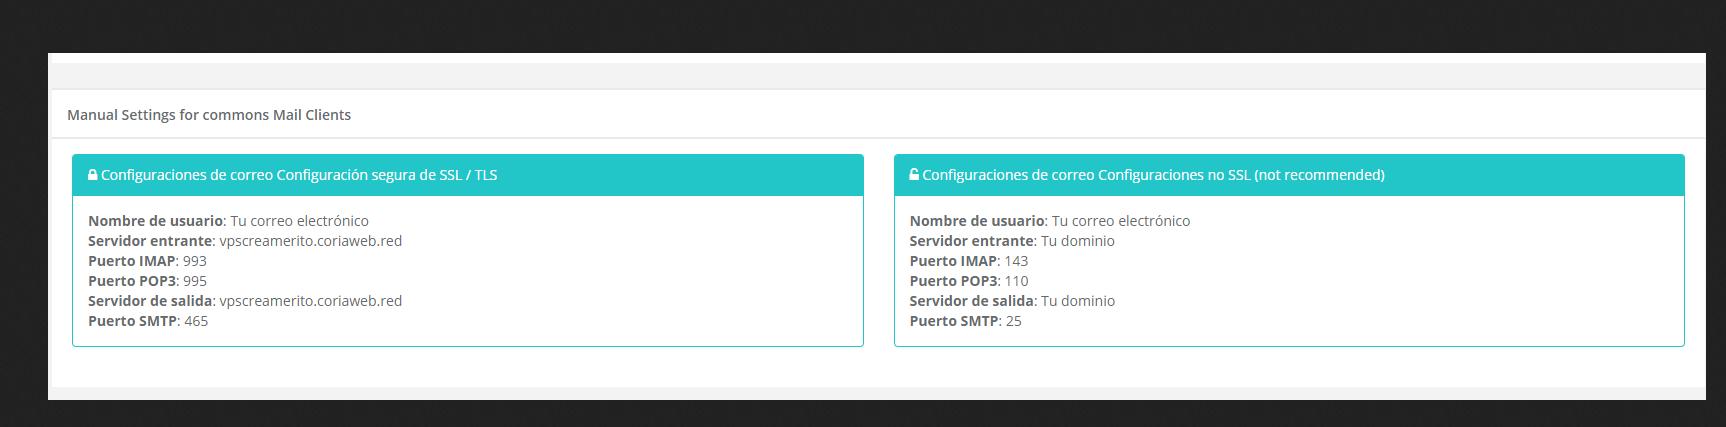 https://www.creamerito.com/wp-content/uploads/2020/10/Configuracion-cuentas-correo.png